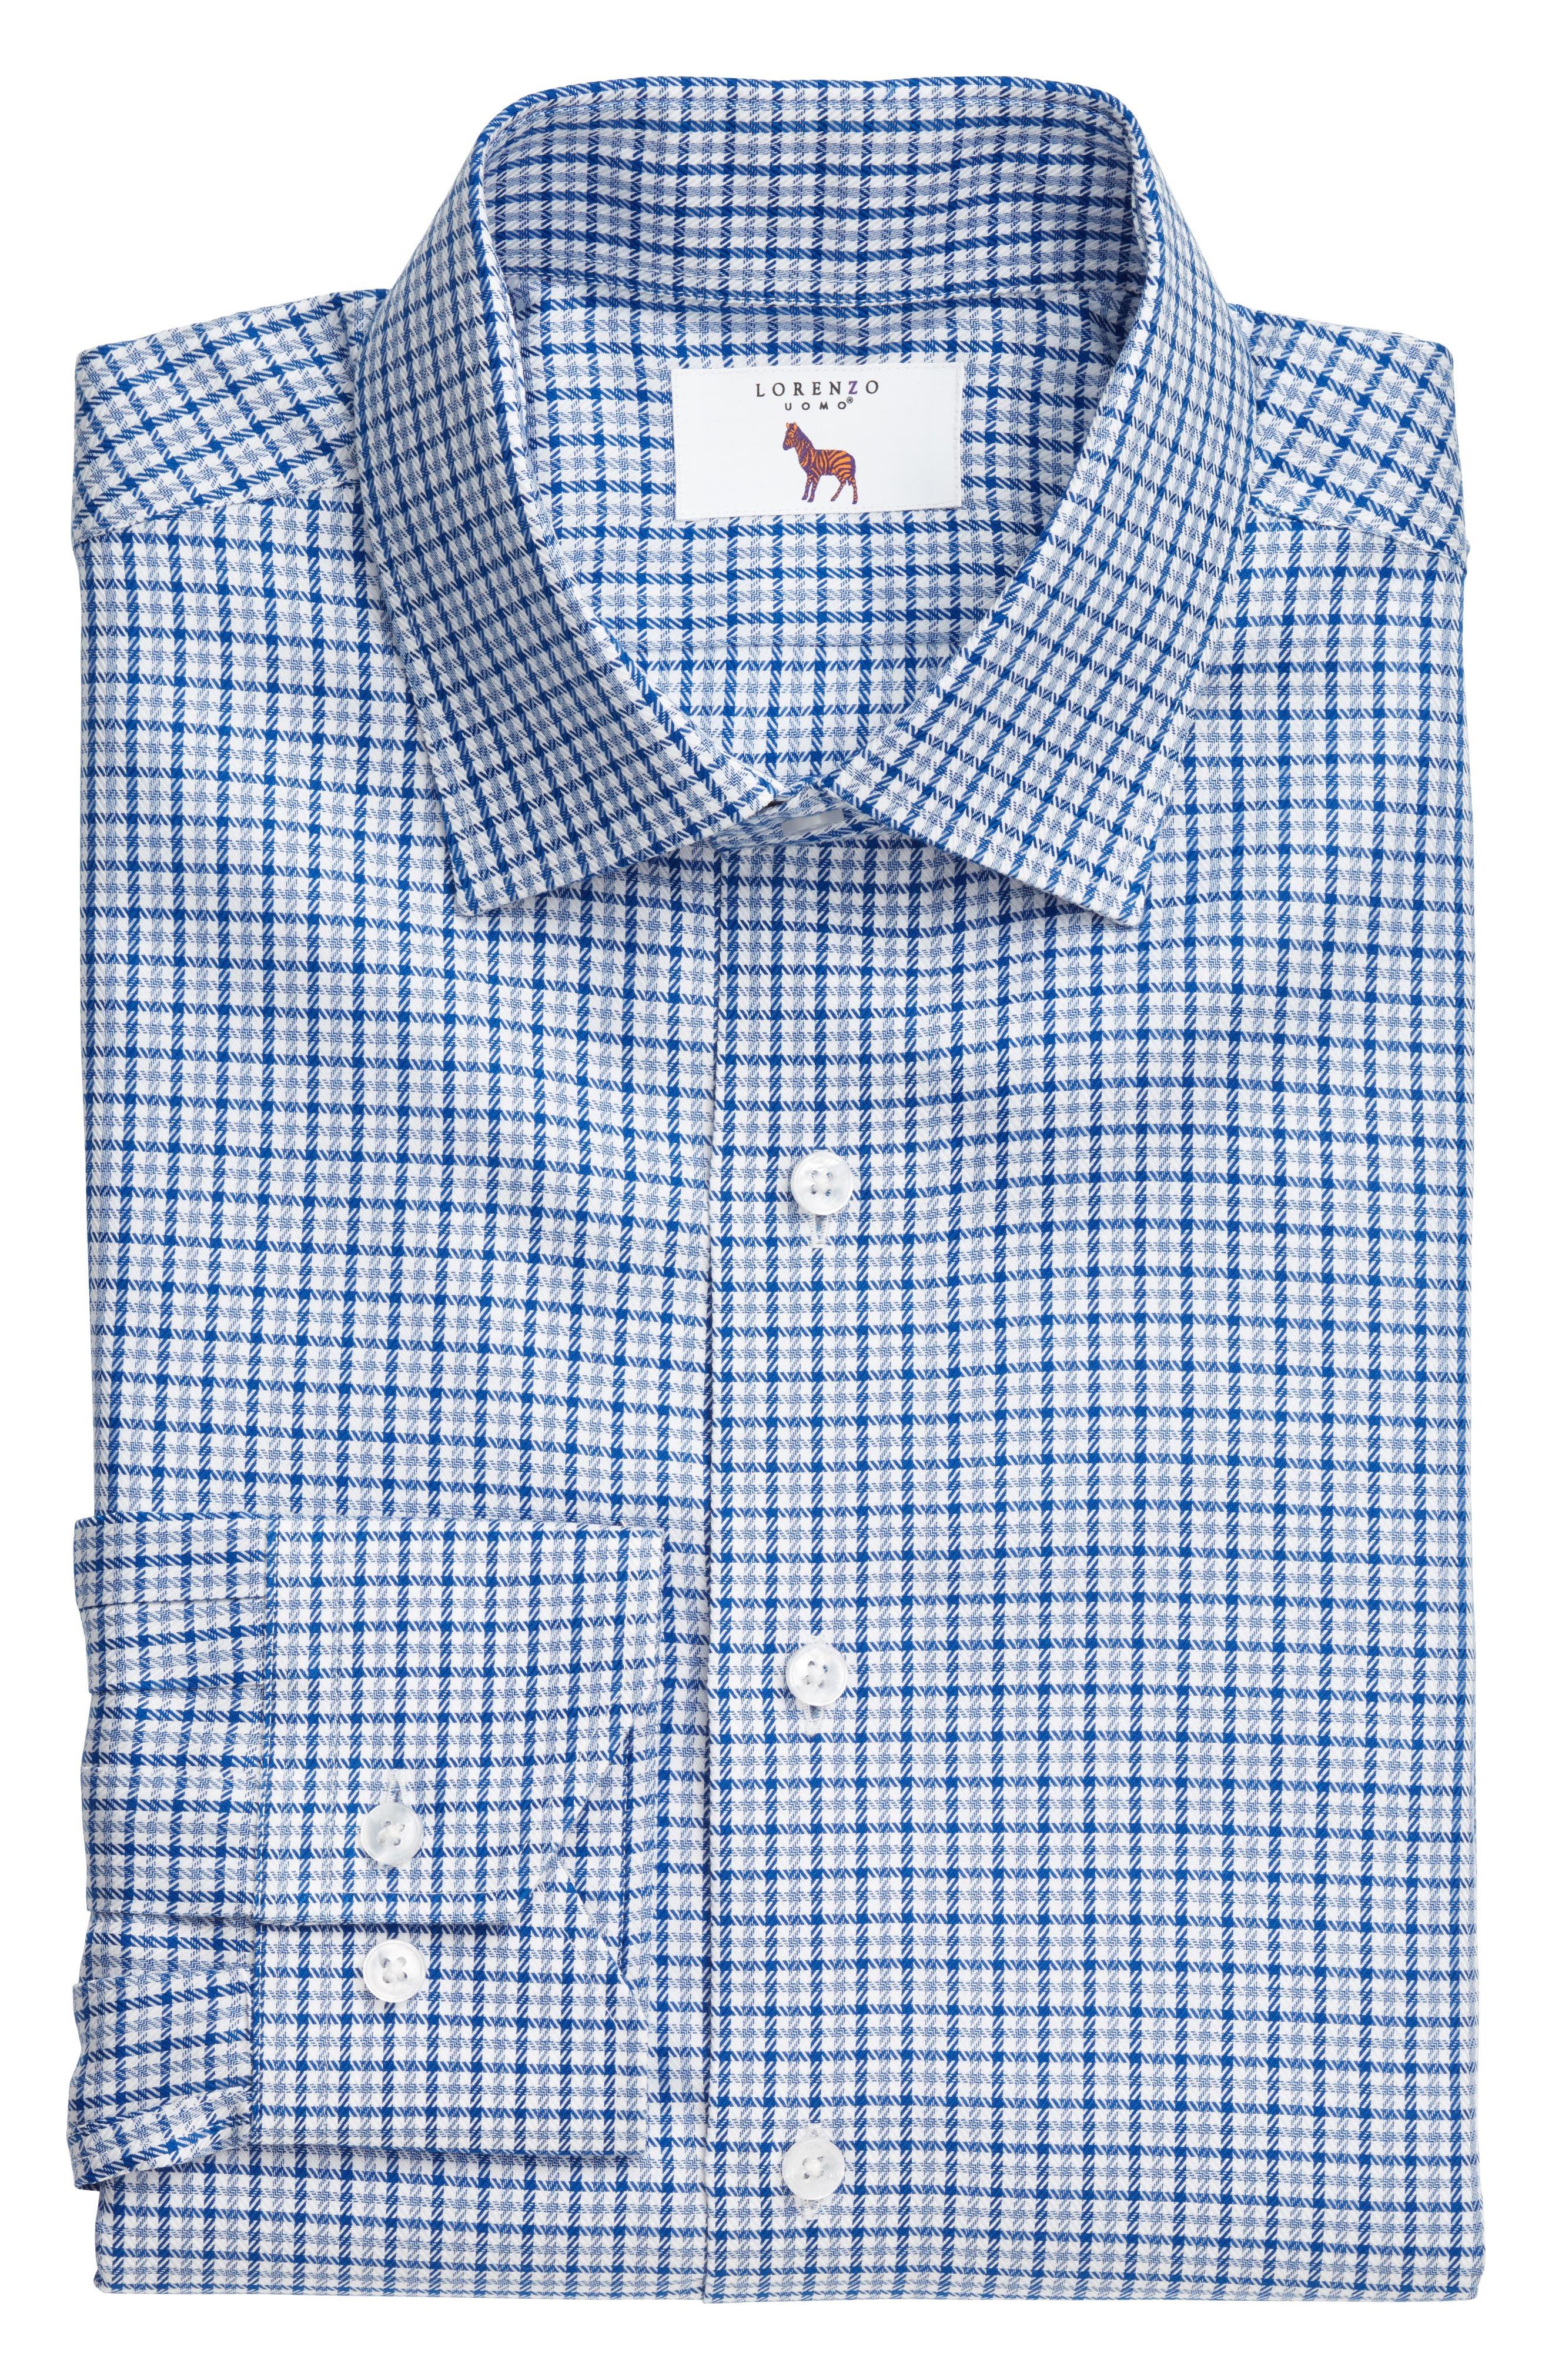 Main Image - Lorenzo Uomo Trim Fit Textured Check Dress Shirt